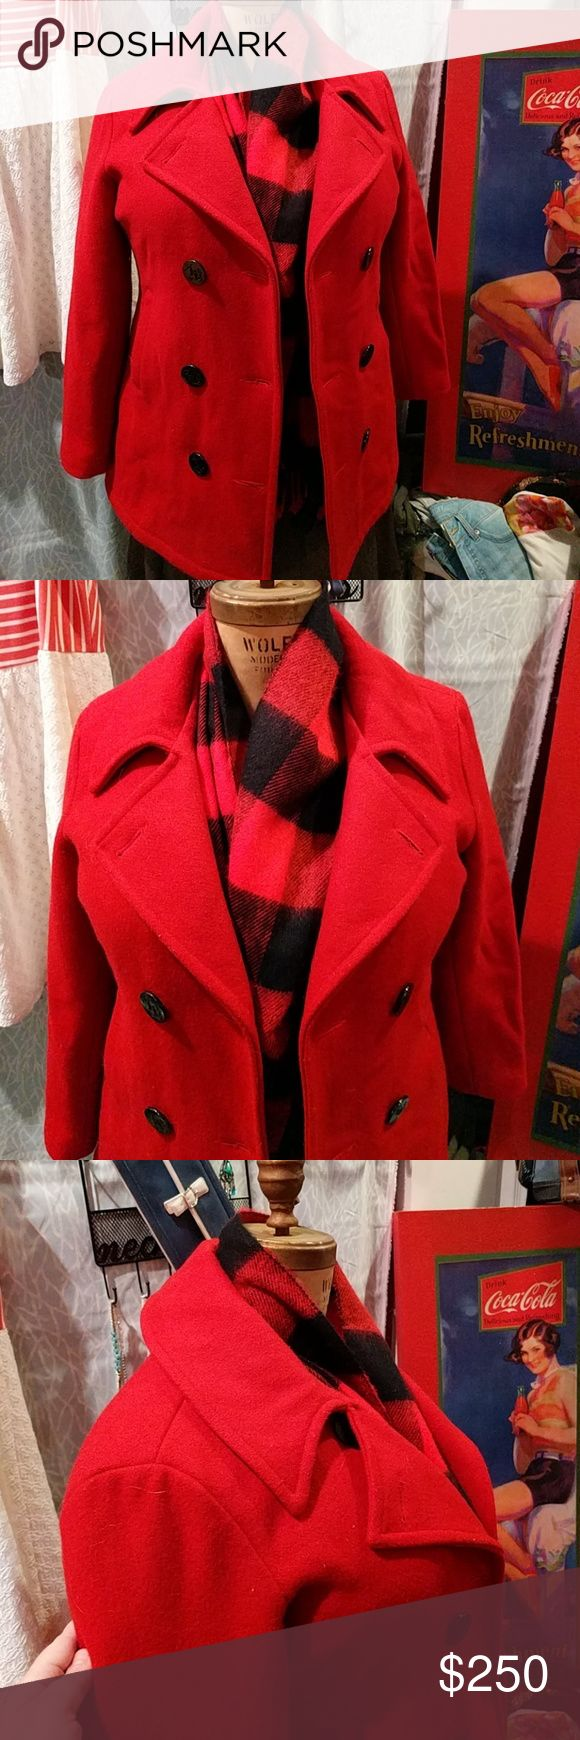 🔥RARE Vintage US Navy Red Pea Coat made in USA Authentic US Navy Red Pea Coat made in USA US Navy Jackets & Coats Pea Coats